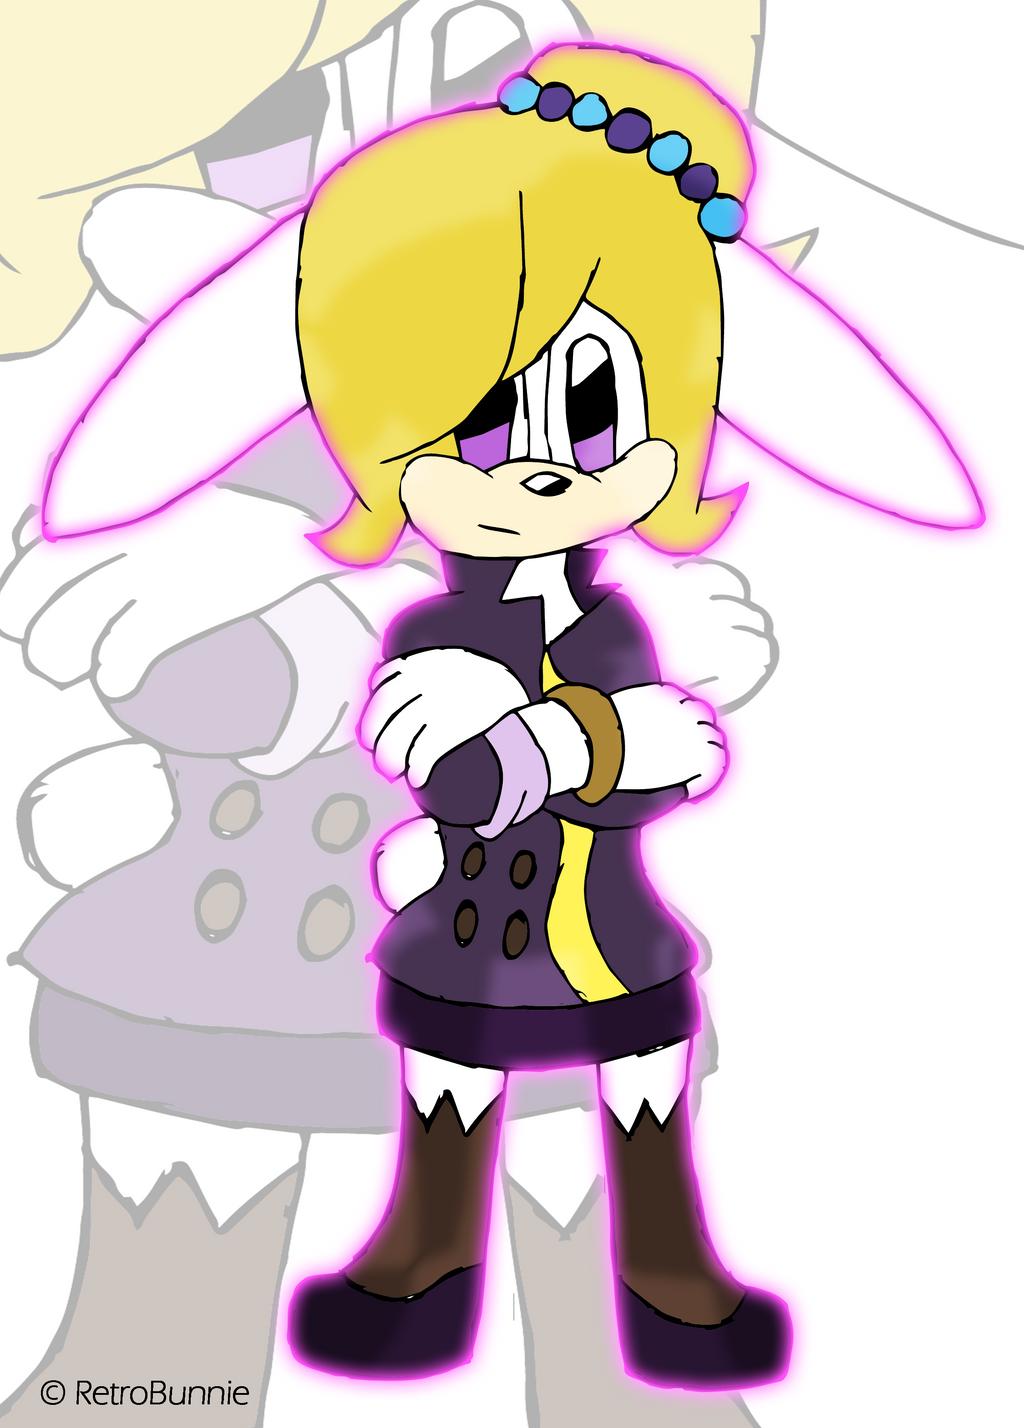 RetroBunnie Art Thread - Page 3 Daisy_daylight_the_rabbit___retrobunnie_by_retr0bunnie-dac8iha